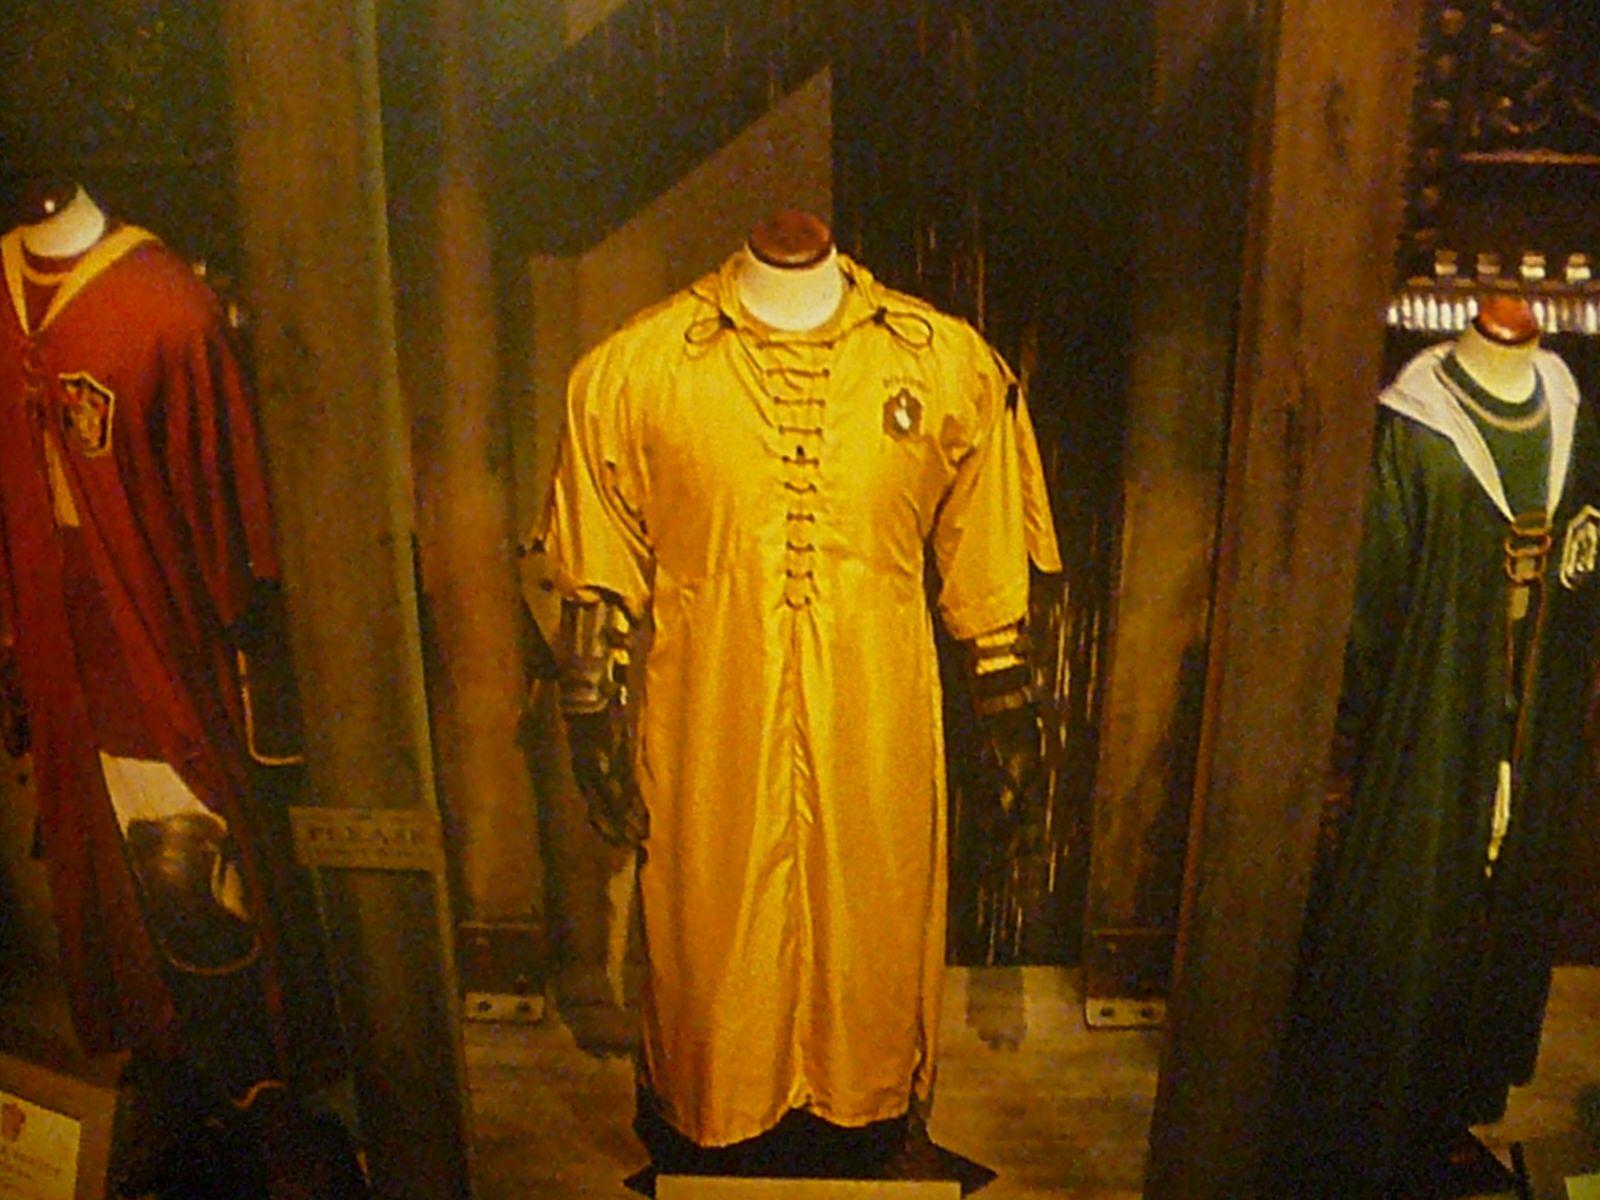 Hufflepuff Quidditch Robes